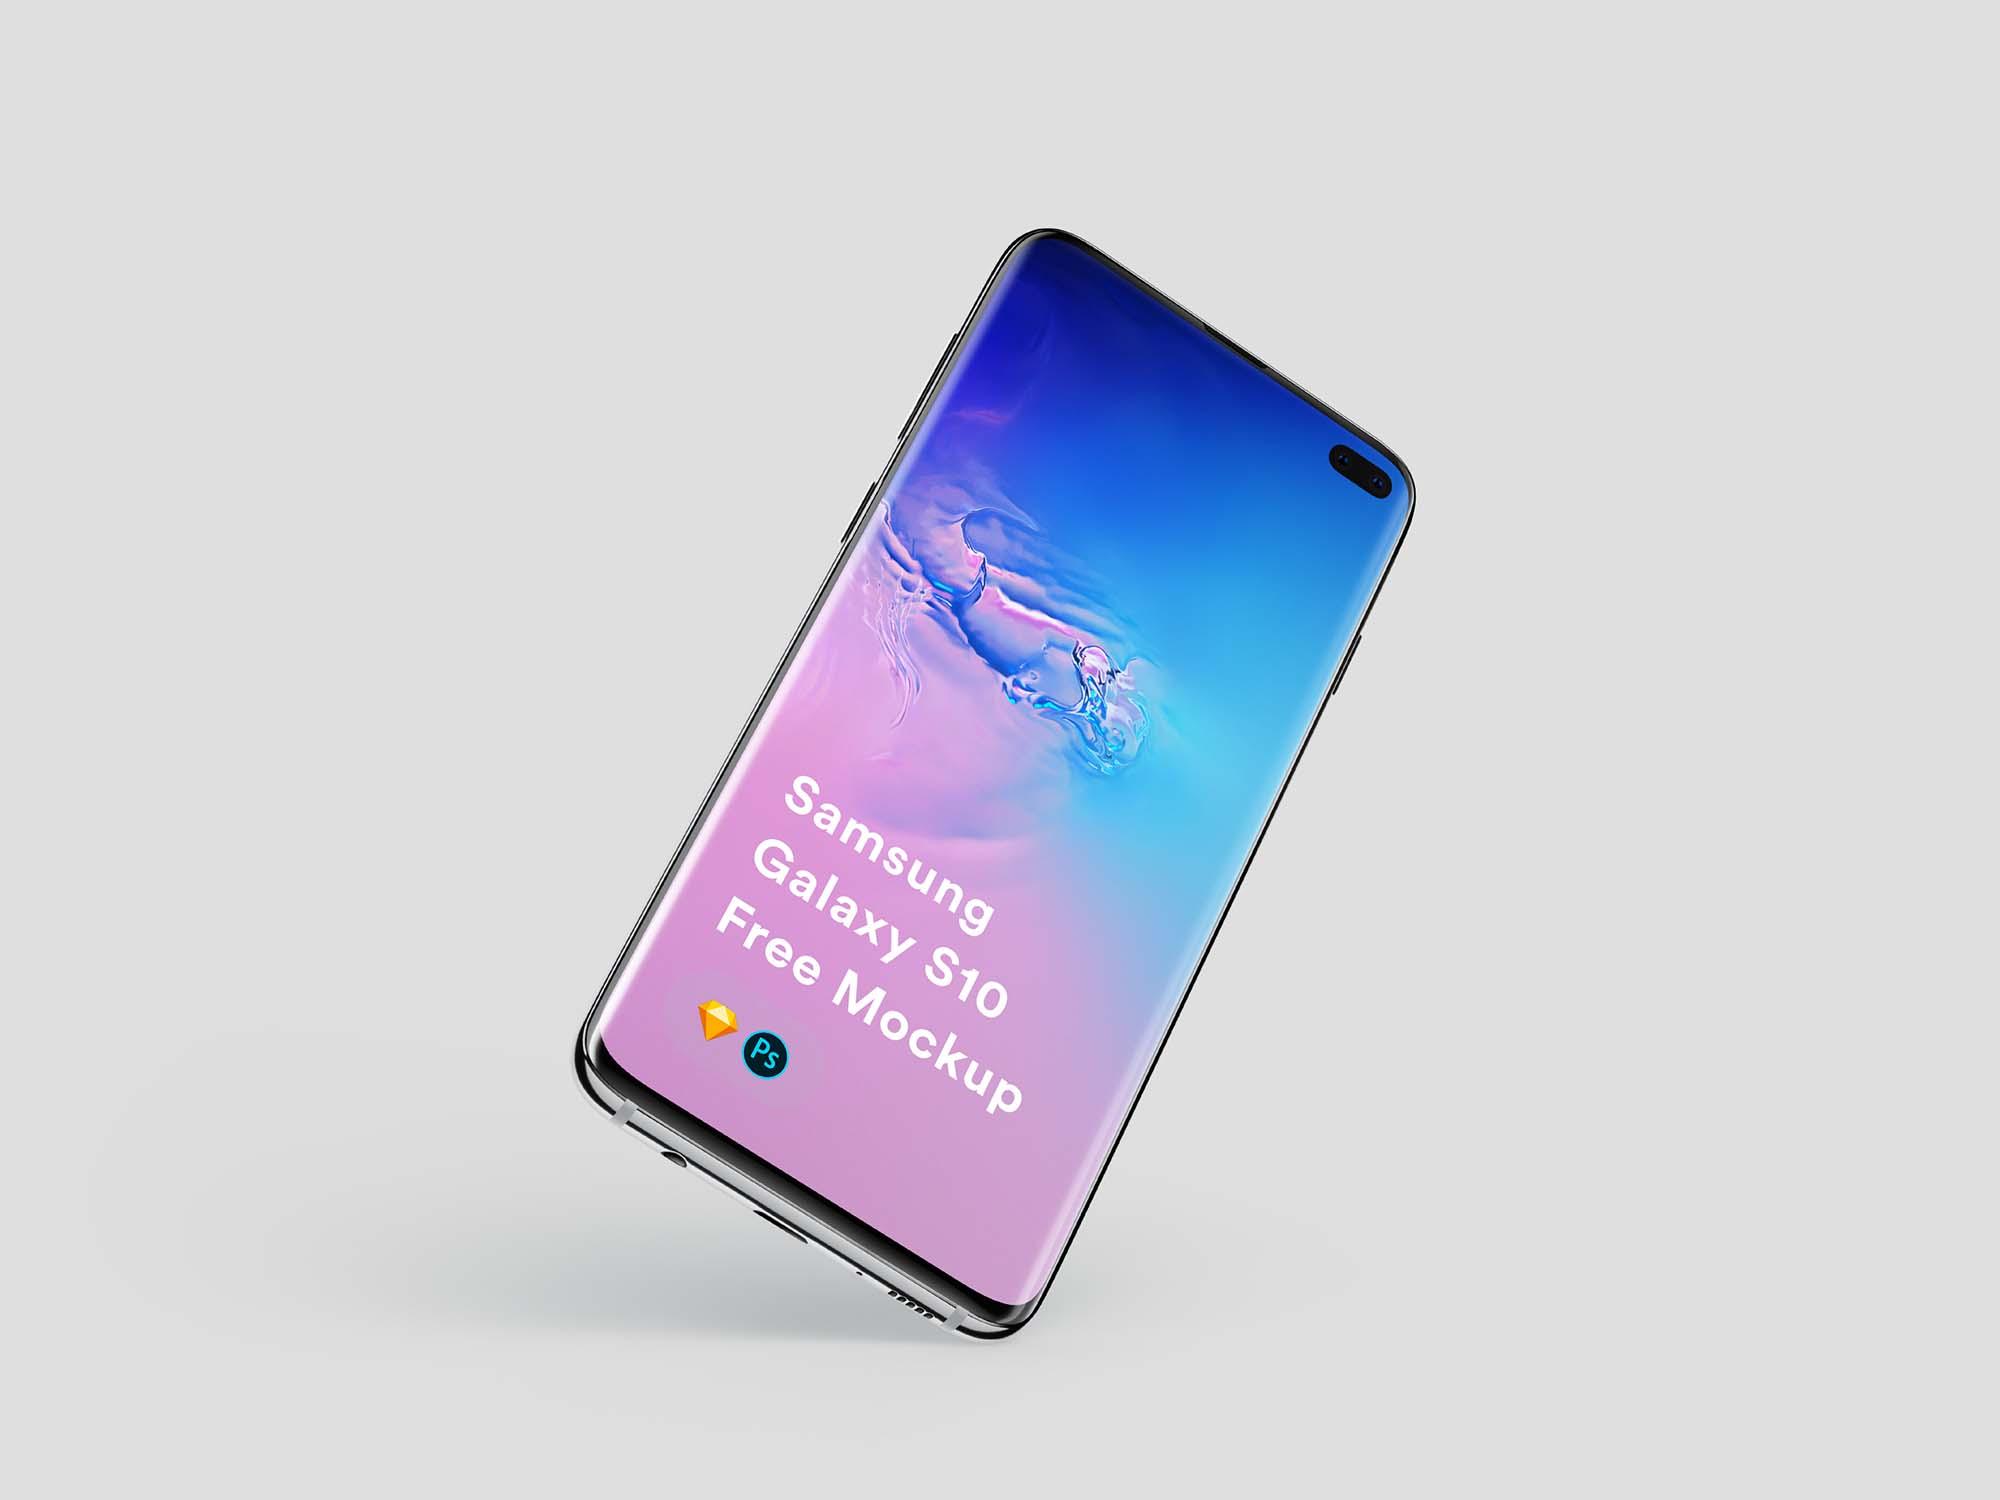 Samsung Galaxy S10+ Mockup 1